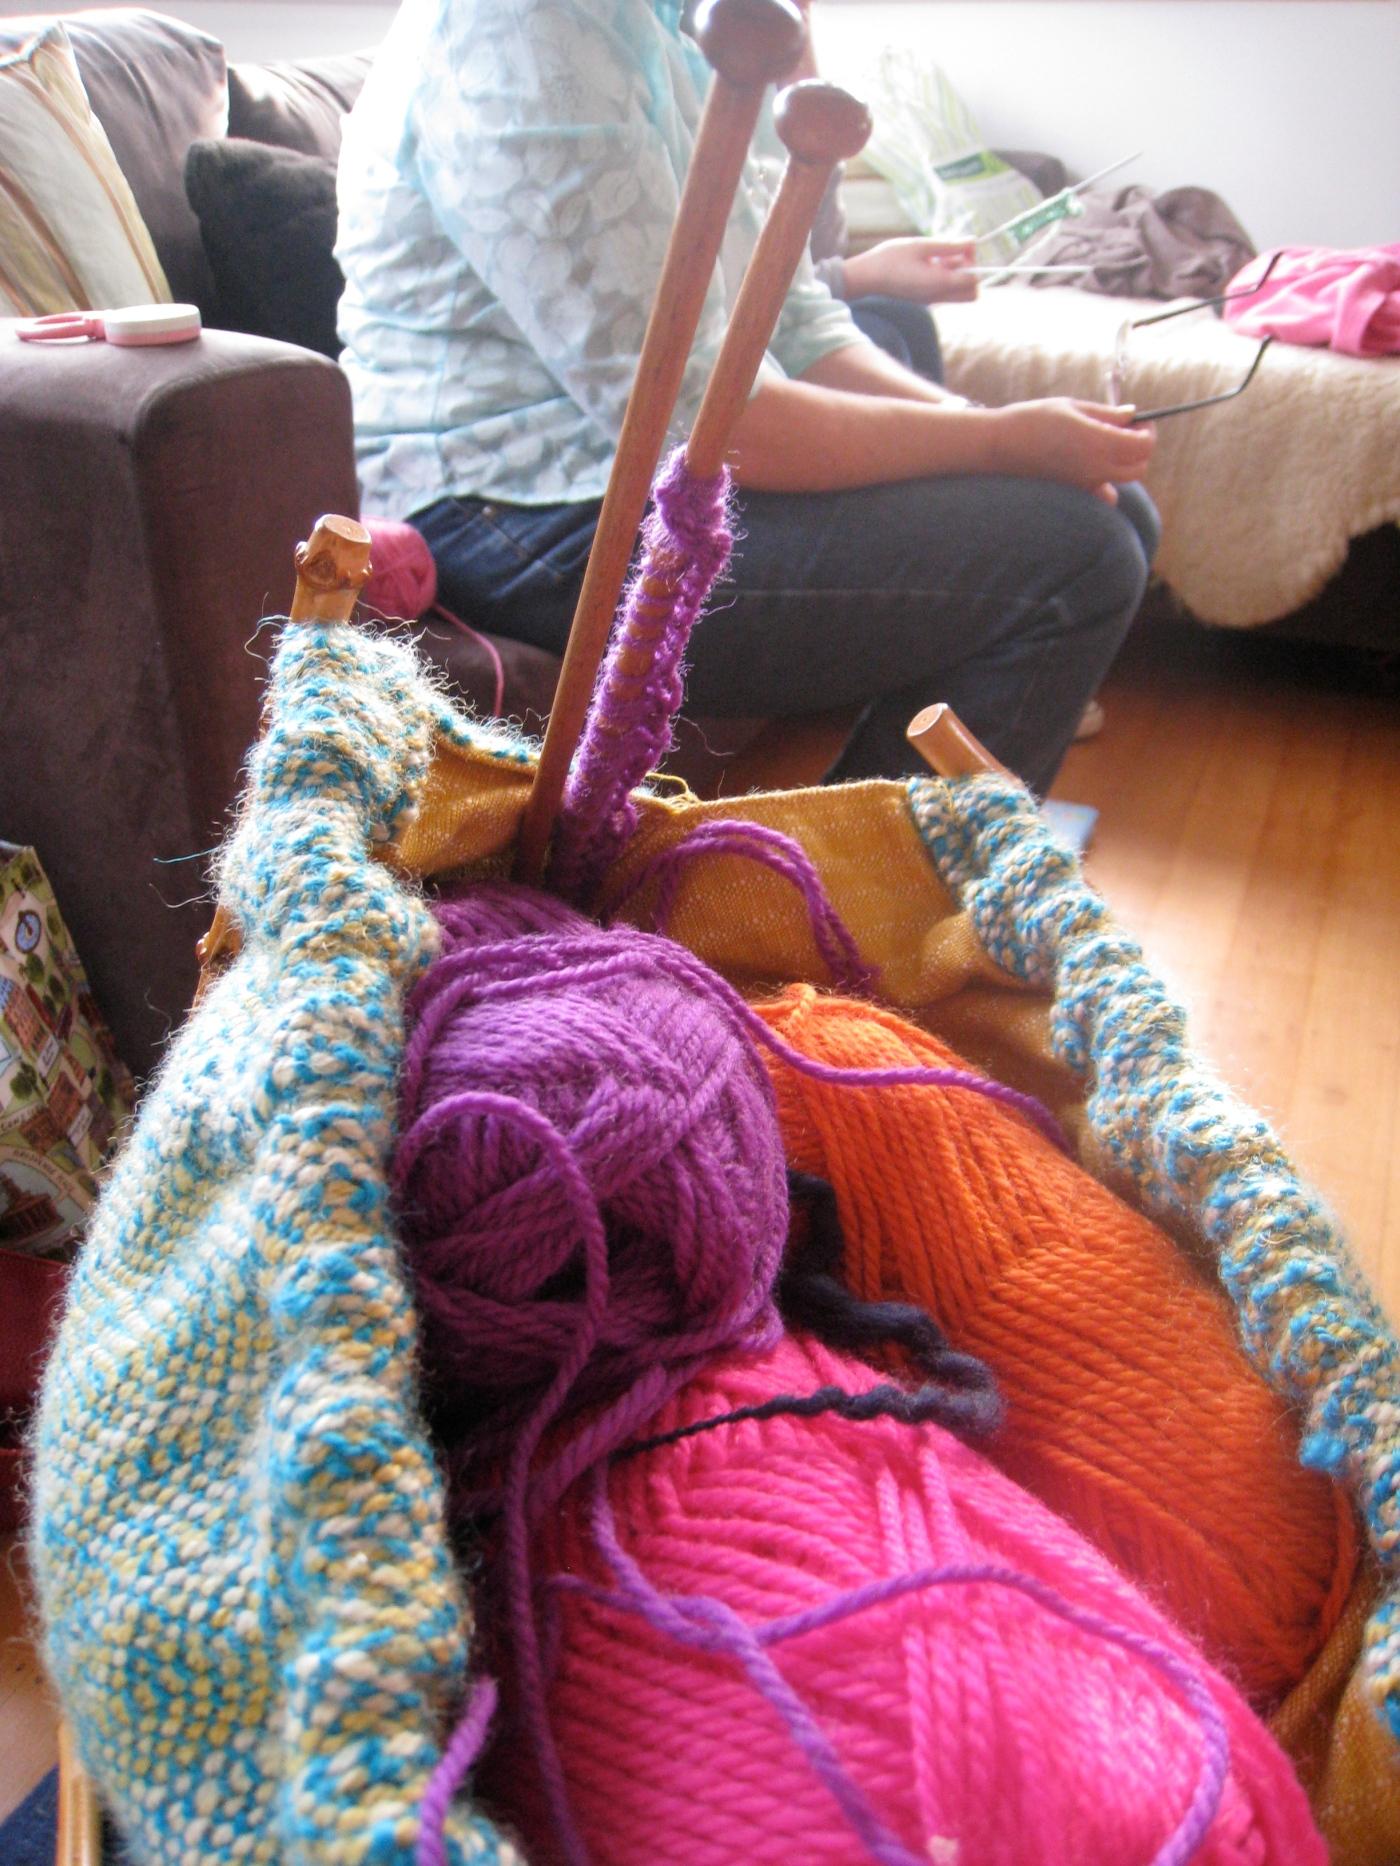 Sarah's knitting bag - wild & grace's knitting bee